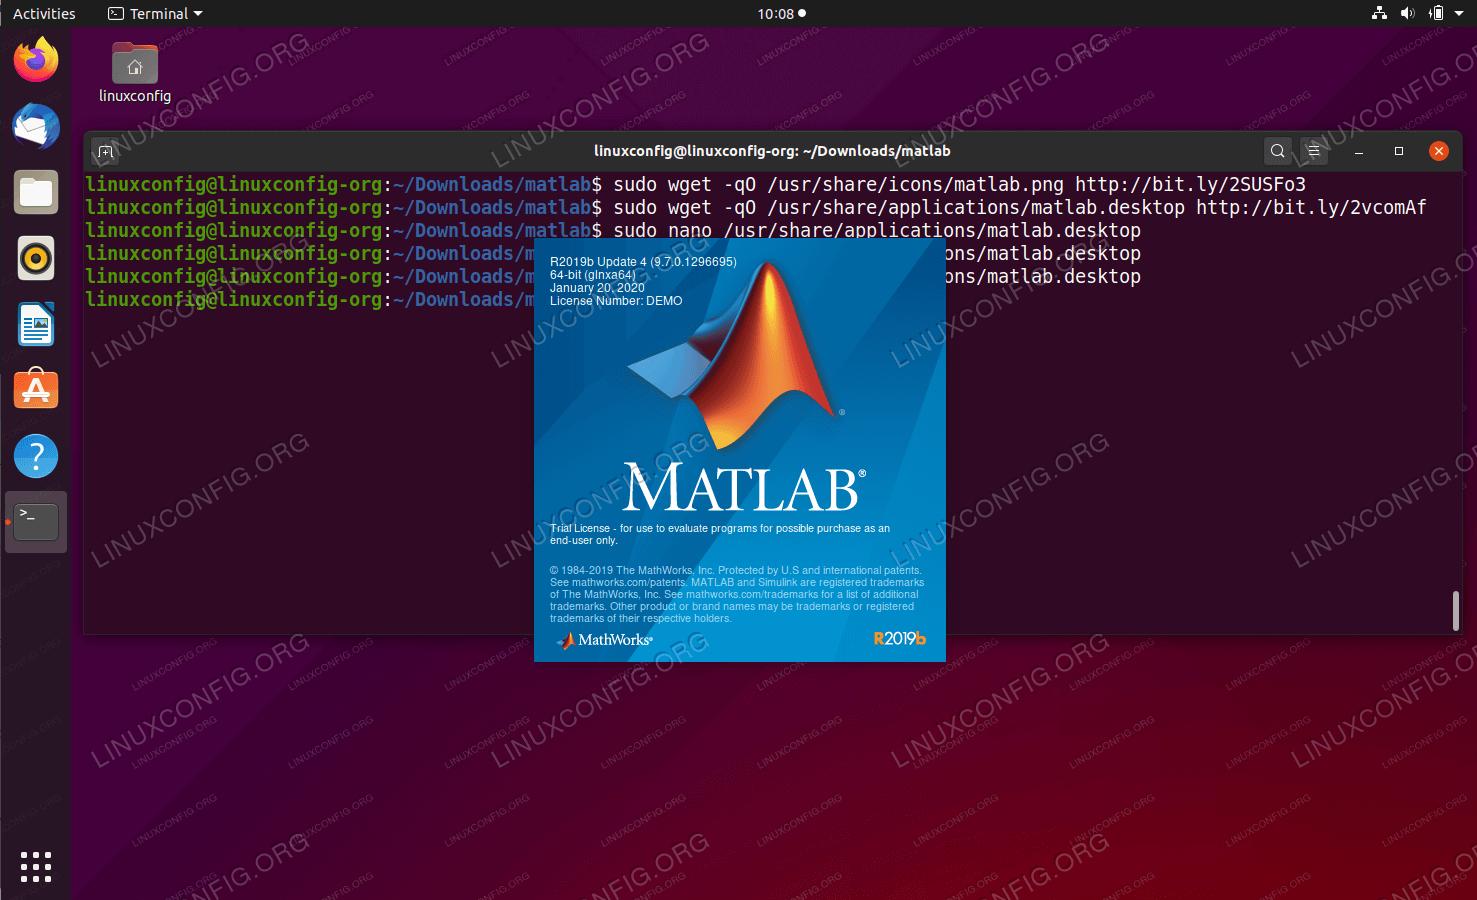 Matlab is starting